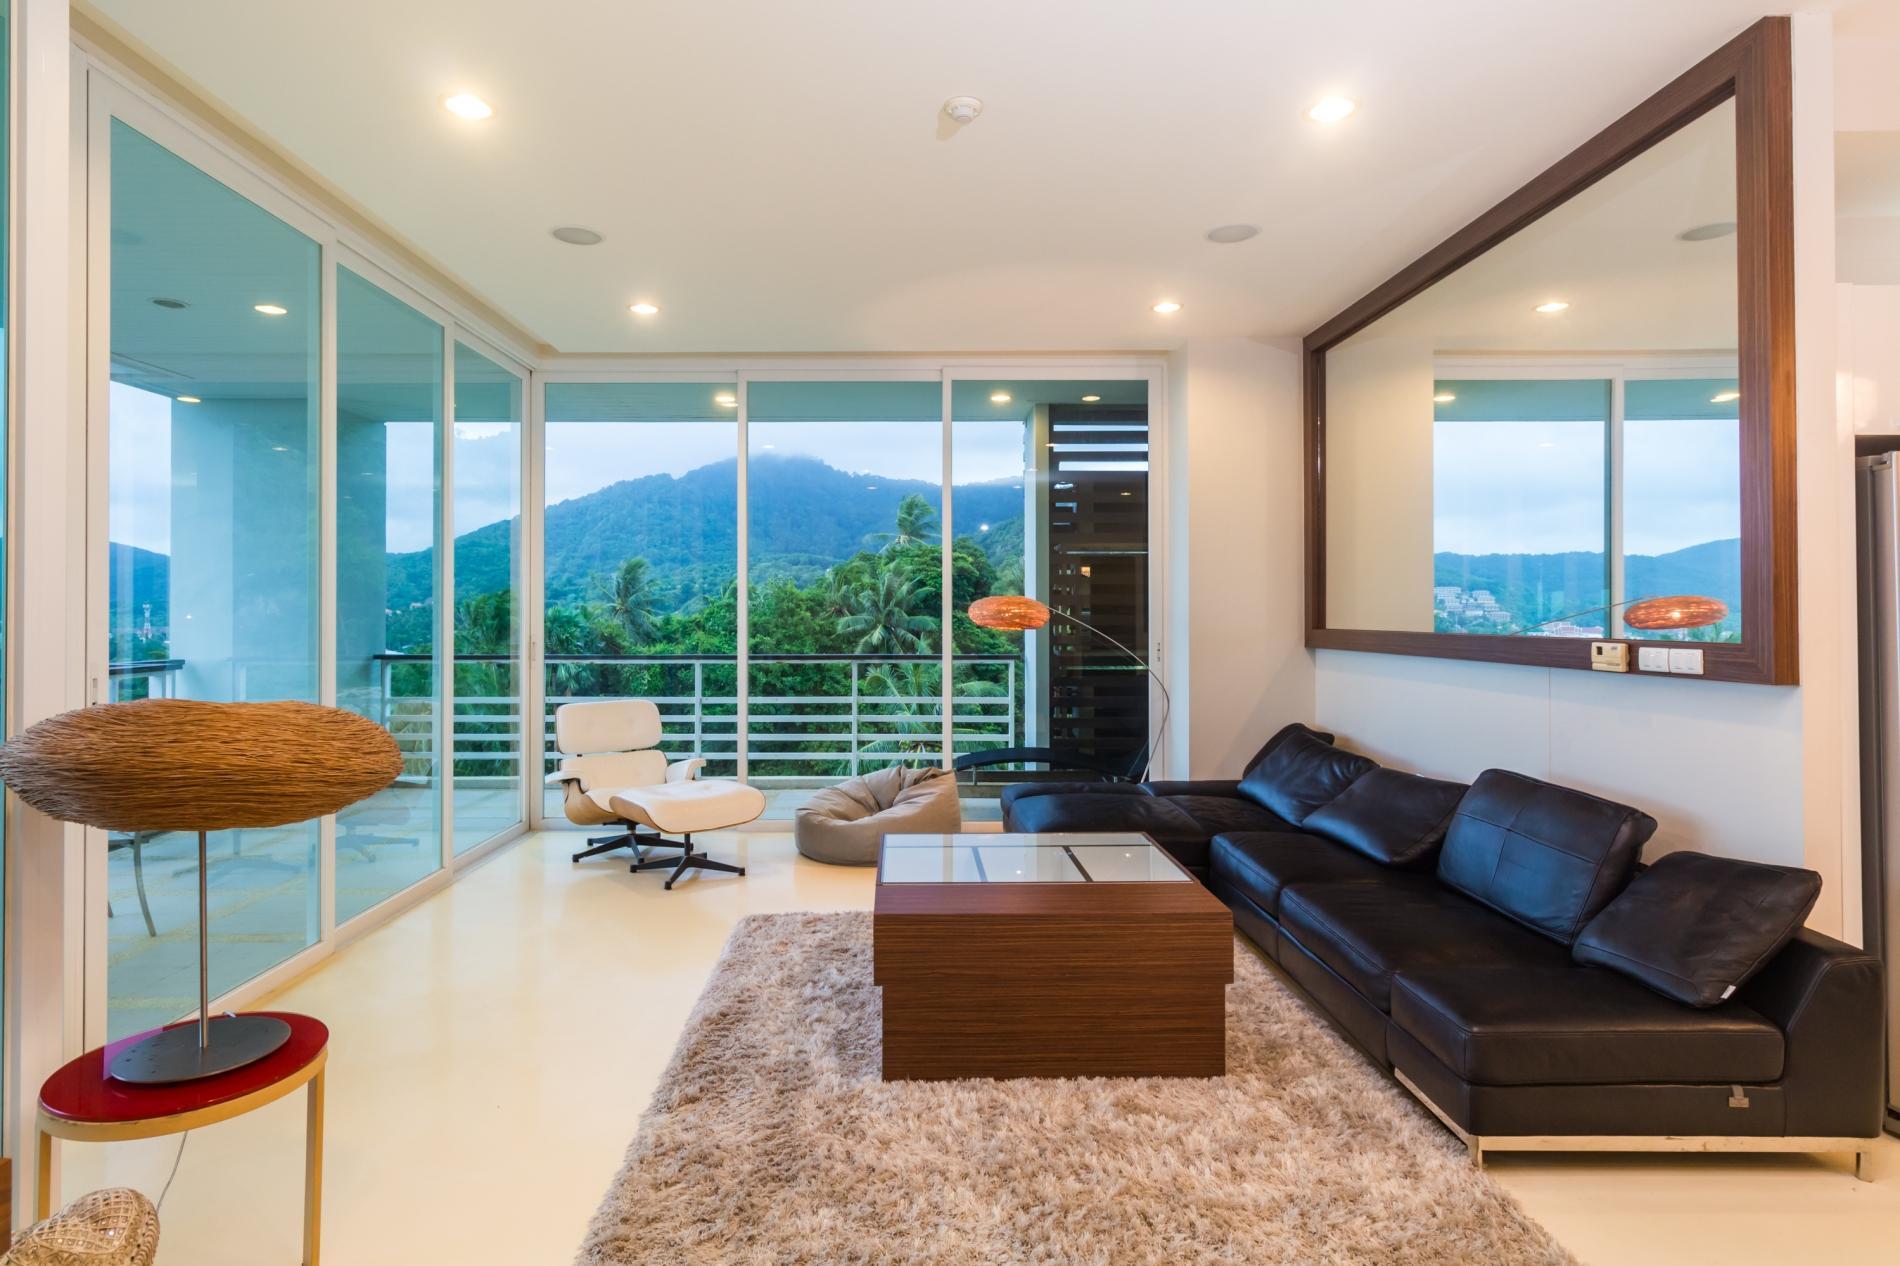 KH2605 - Sea-view Penthouse in Karon, walk to beach, restaurants, bars, shops photo 20390382